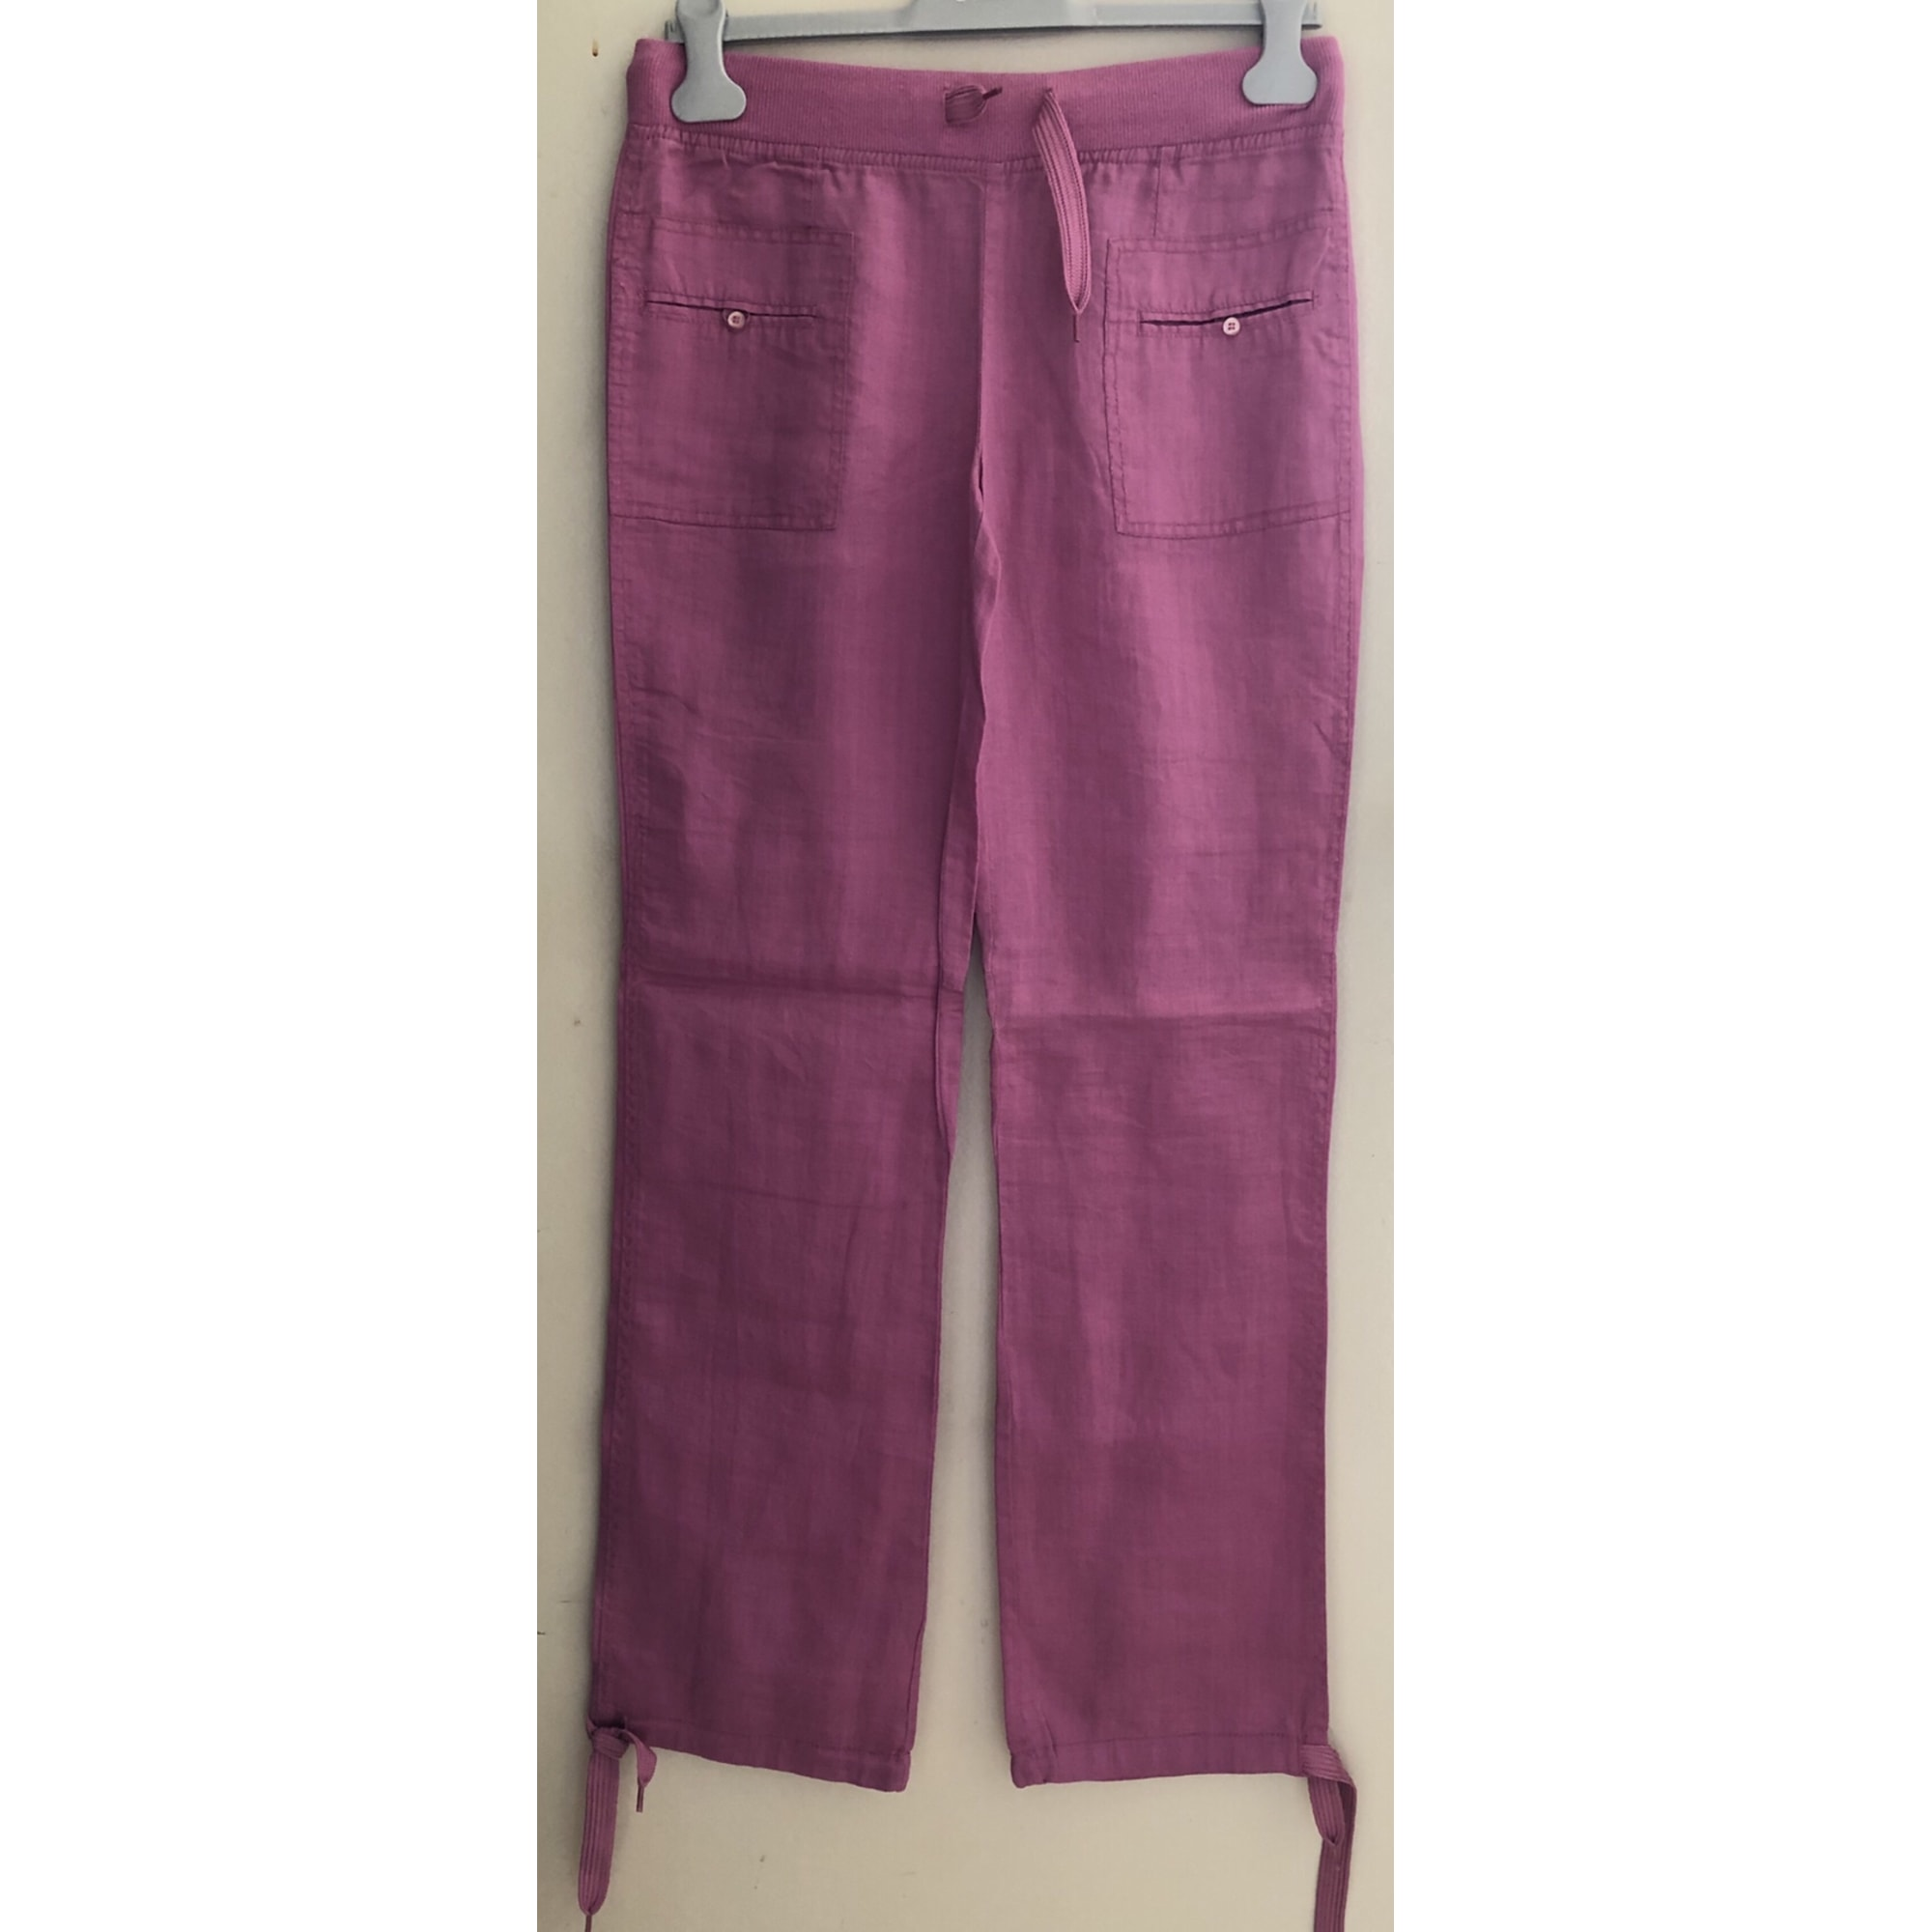 Pantalon droit ETAM Rose, fuschia, vieux rose